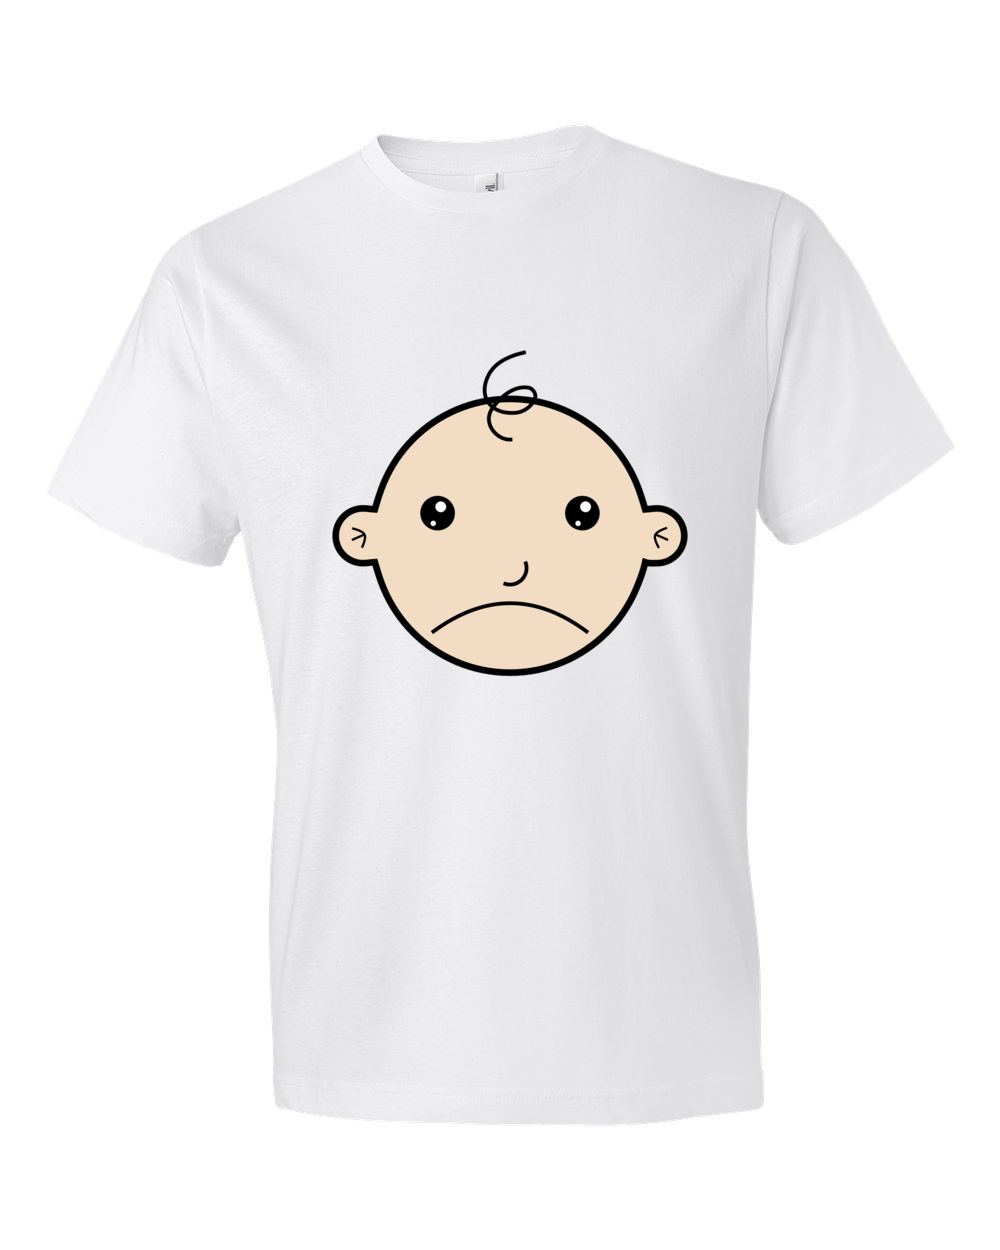 Sad-Baby-Lightweight-Fashion-Short-Sleeve-T-Shirt-by-iTEE.com